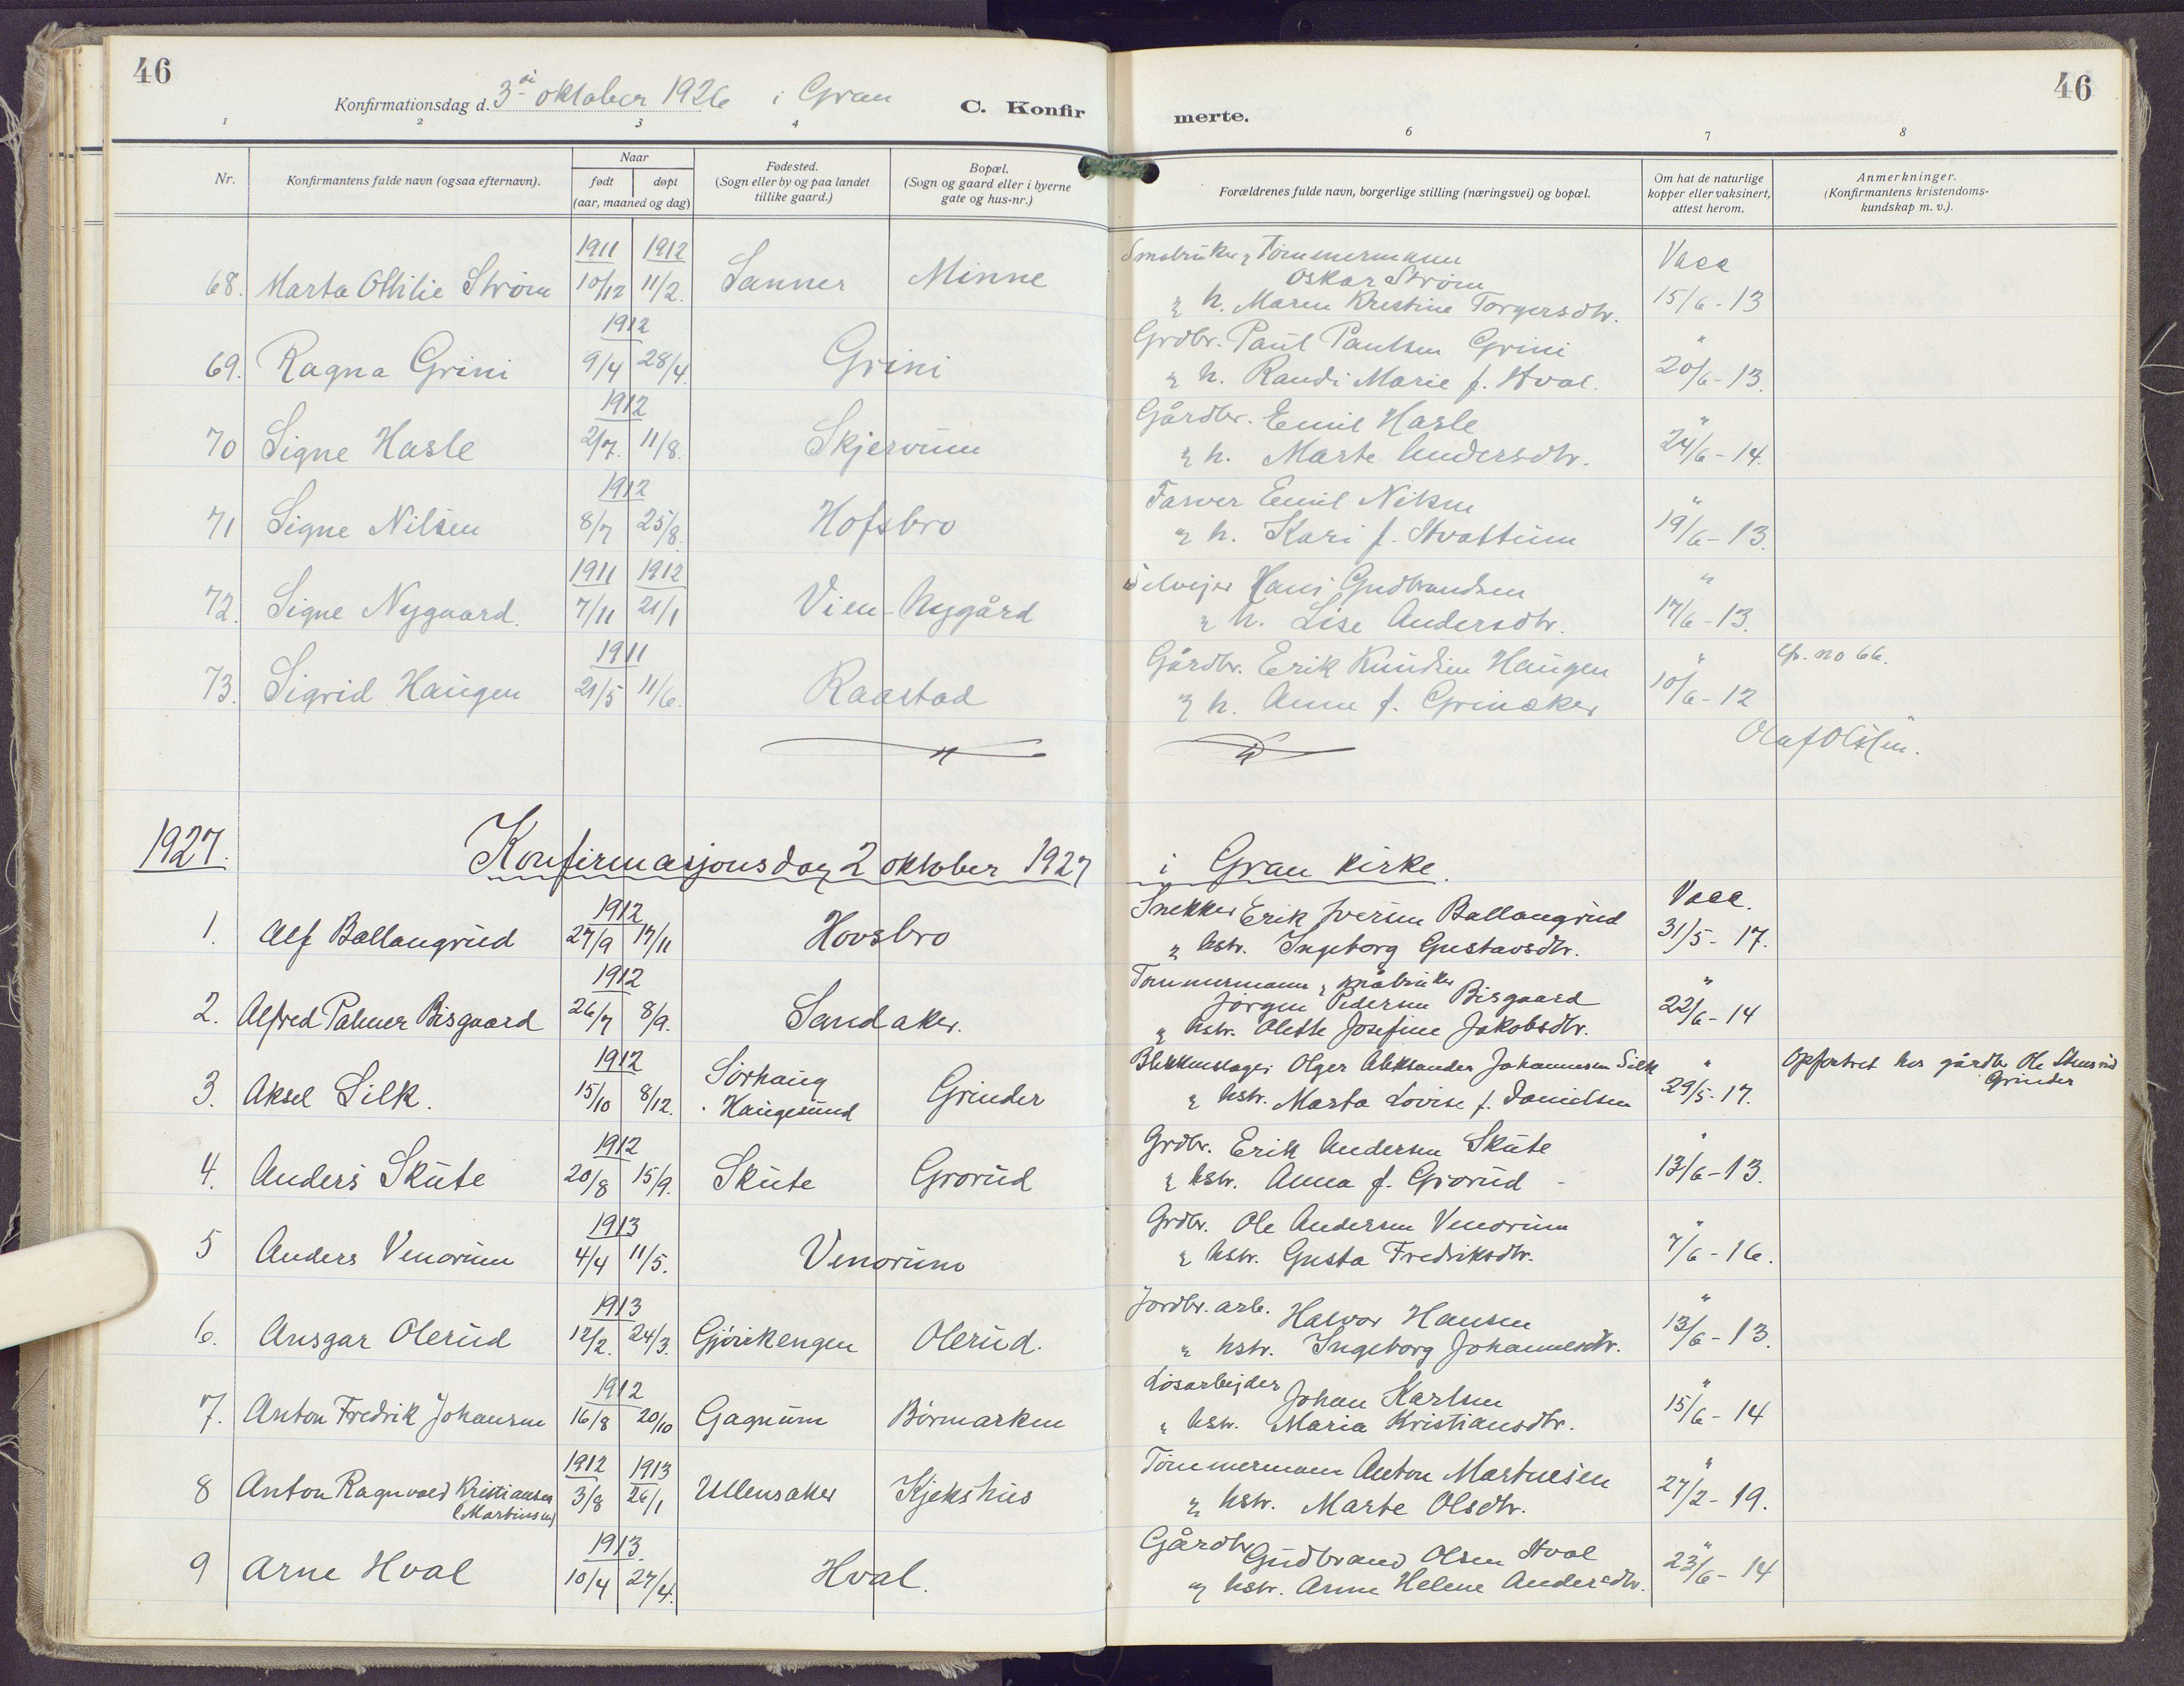 SAH, Gran prestekontor, Ministerialbok nr. 23, 1919-1938, s. 46